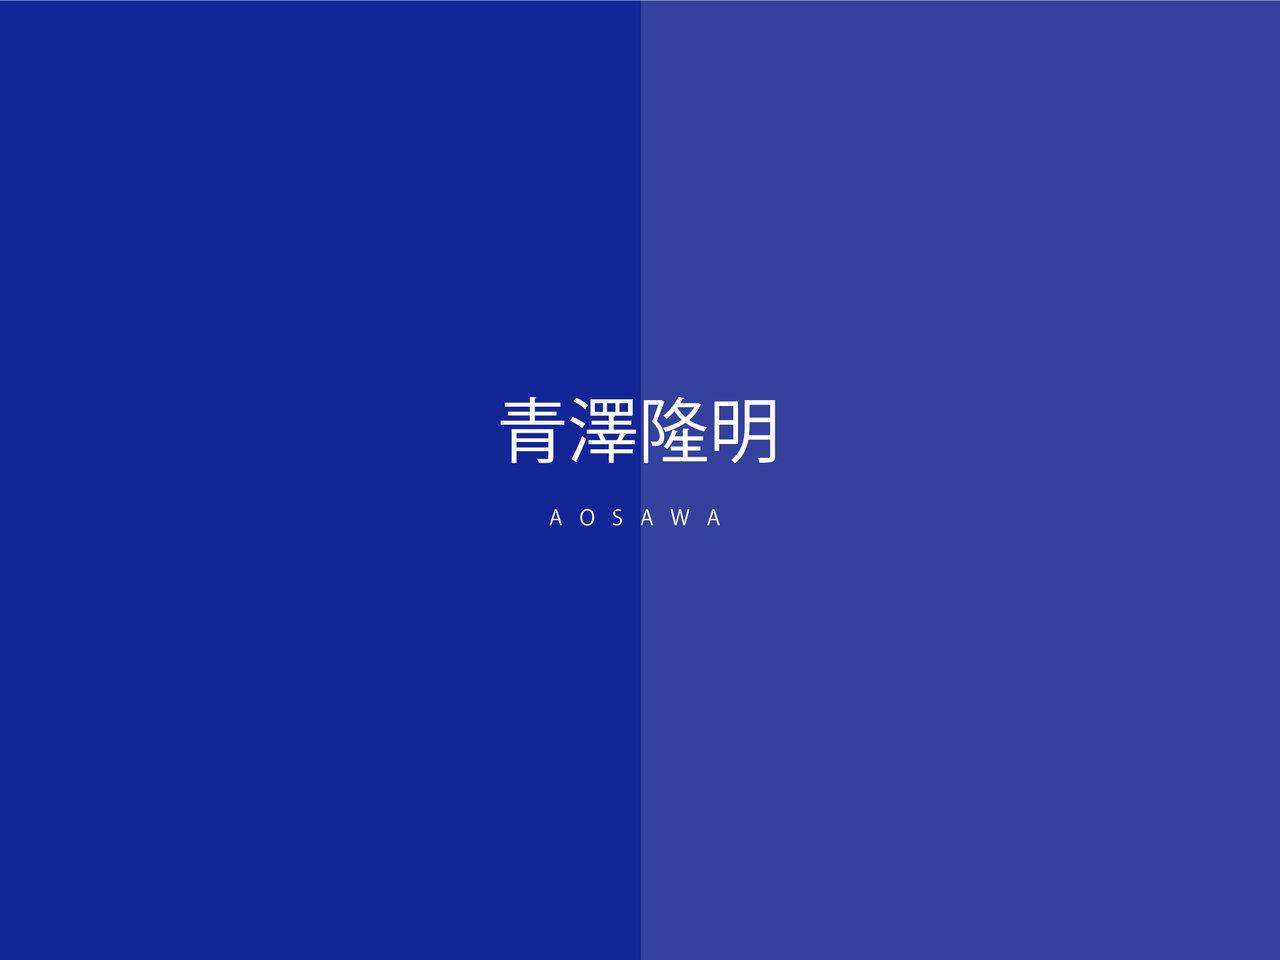 Englishman in Kawasaki, Paris & New York -ジョナサン・ノットと東京交響楽団のフェスタ サマーミューザ KAWASAKI 2021(青澤隆明)